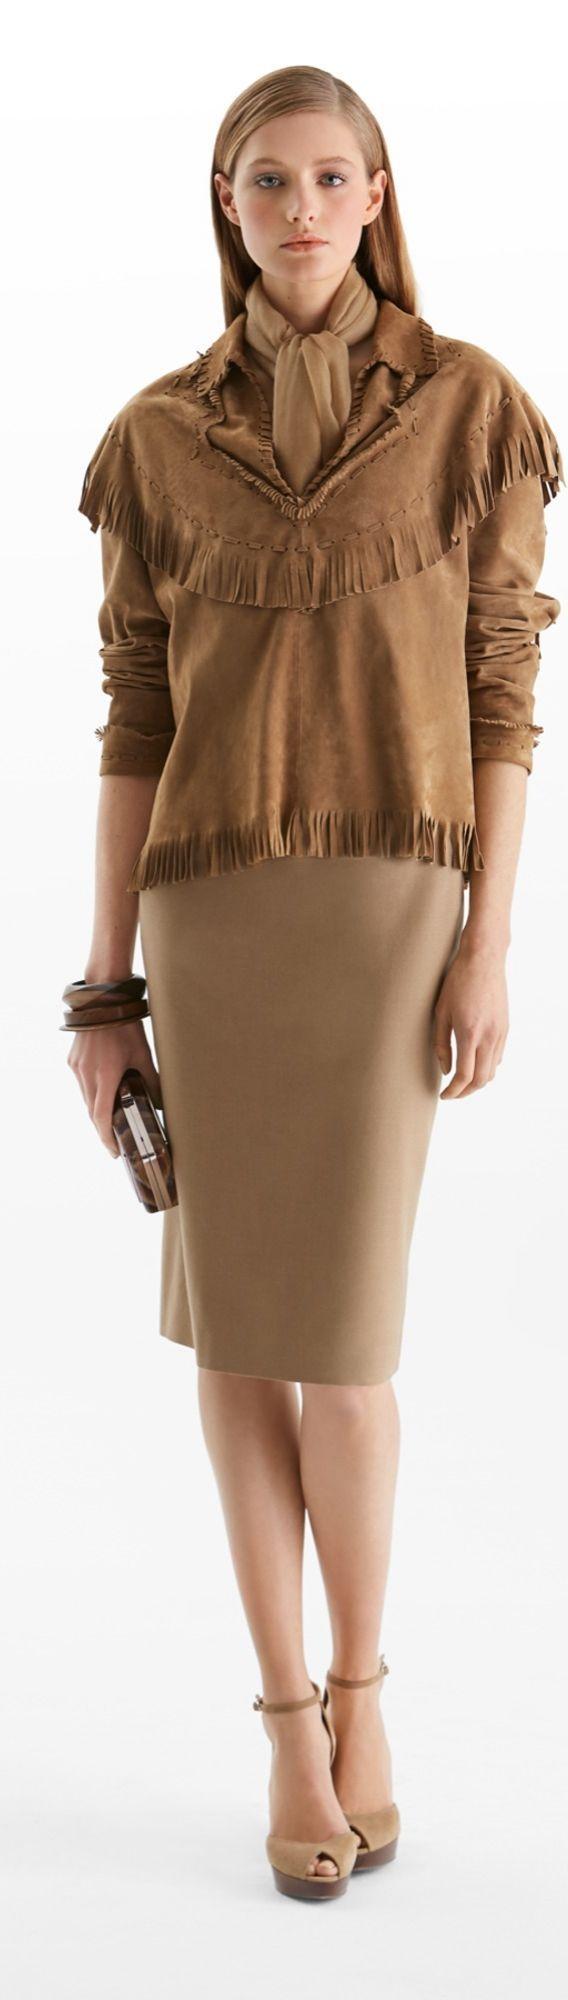 ralph lauren   ♚ Fashionable Footwear ♚   Pinterest   Jupes crayon ... 1f39ffe2f00